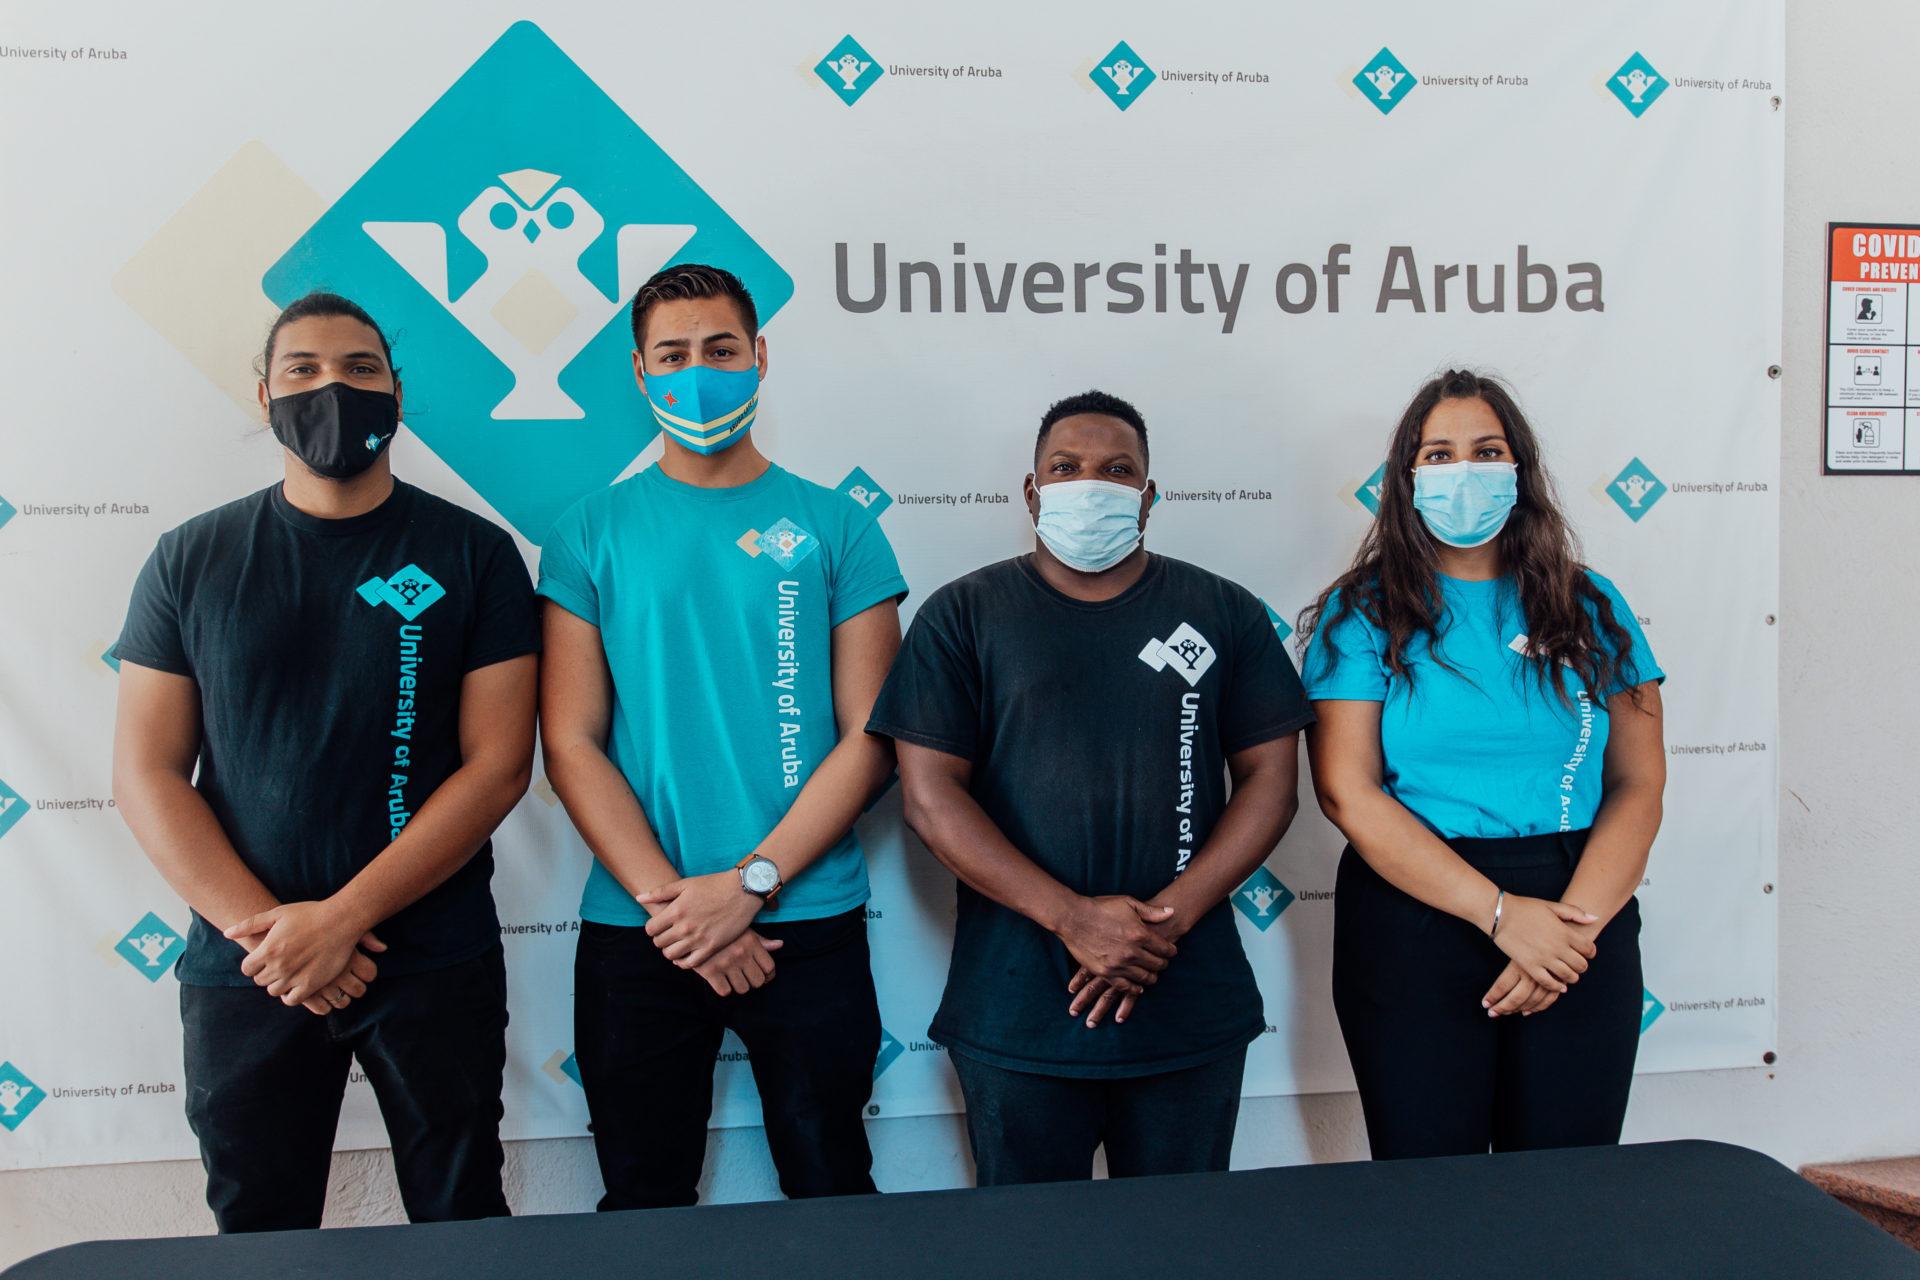 E studiantenan di Universidad di Aruba cu rifa pa yuda Fundacion Pa Nos Comunidad